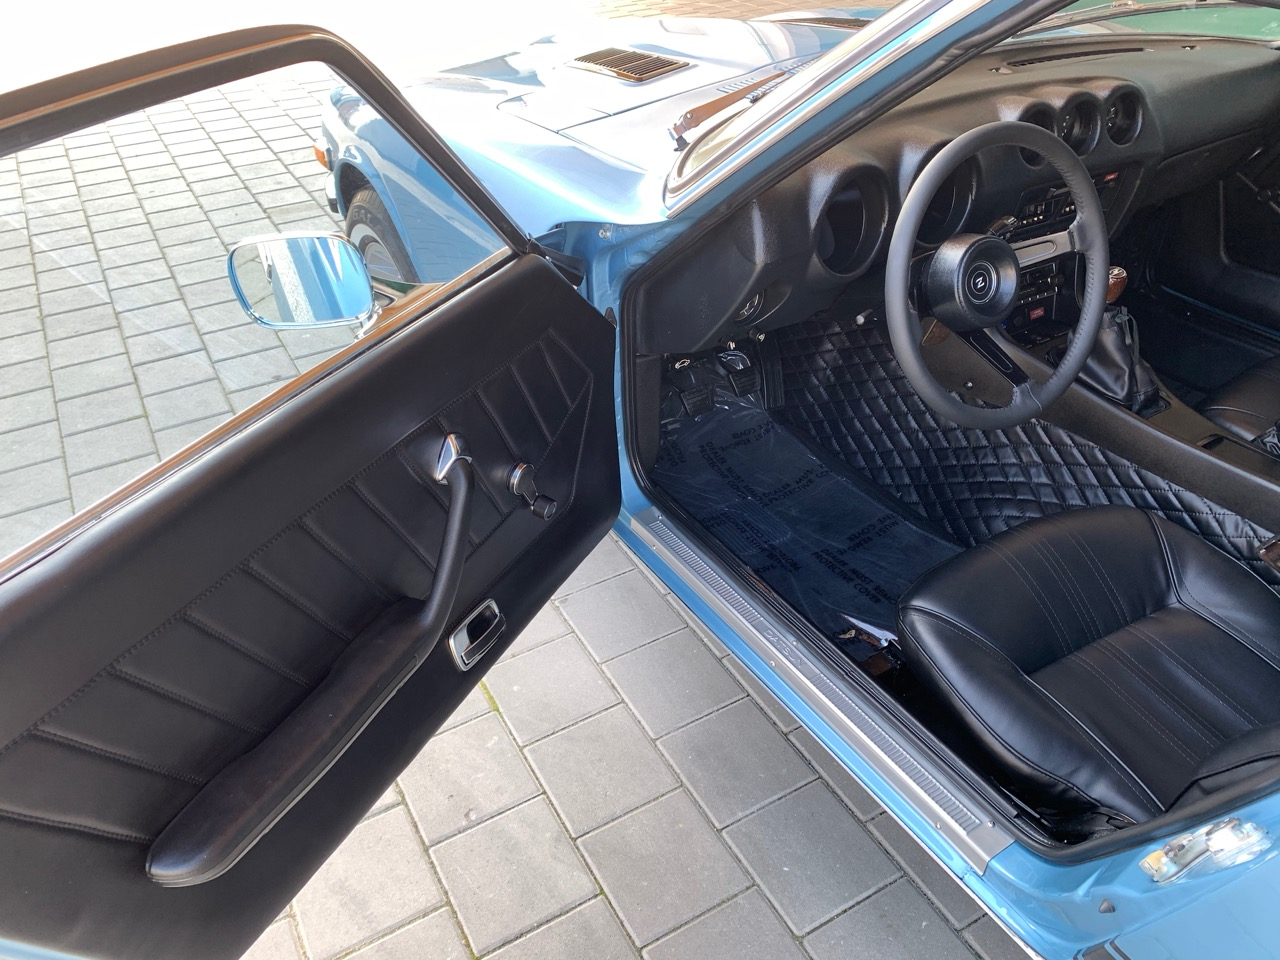 Datsun 280z Original Auto zu verkaufen